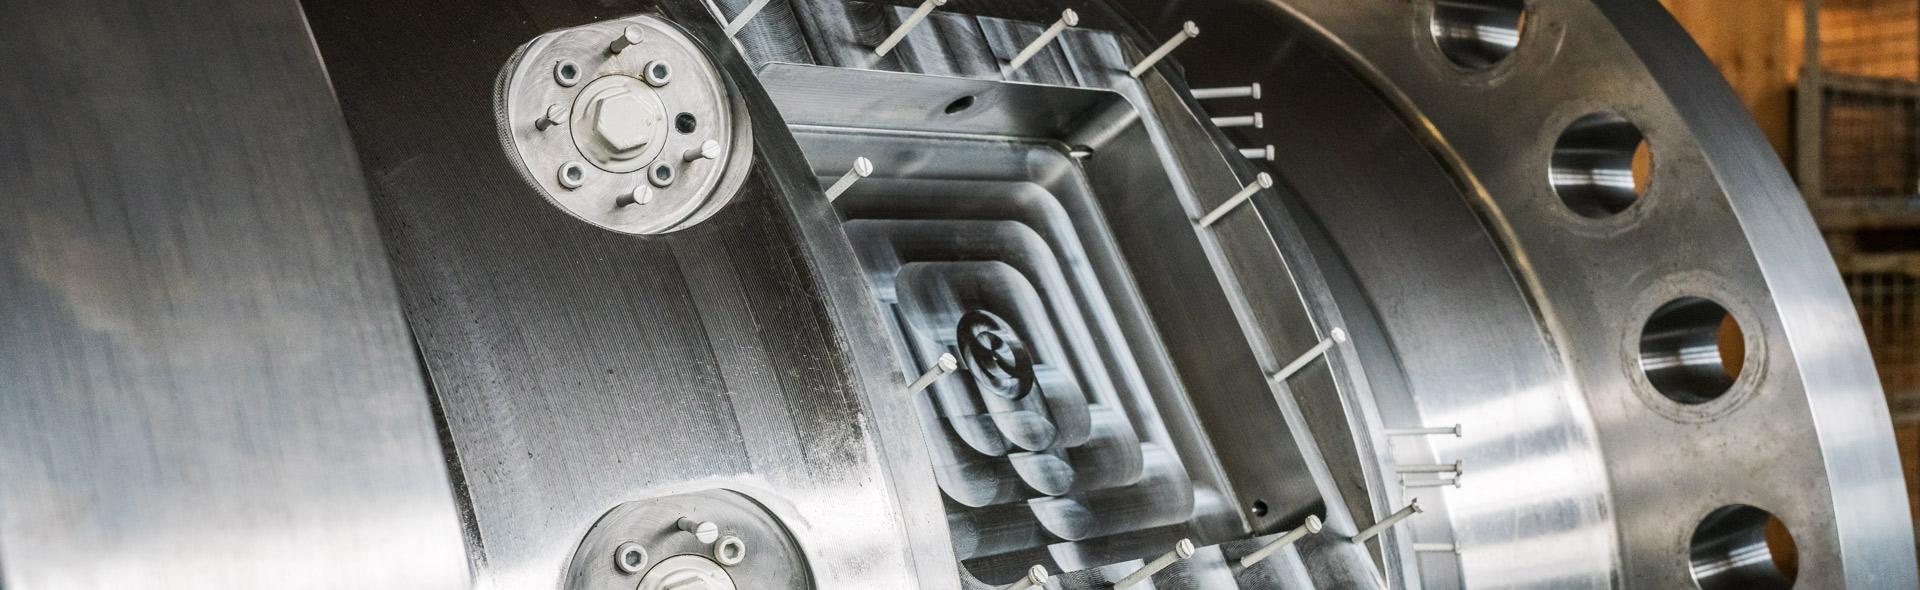 Druckzähler | Maschinenbau Mundil GmbH & Co. KG